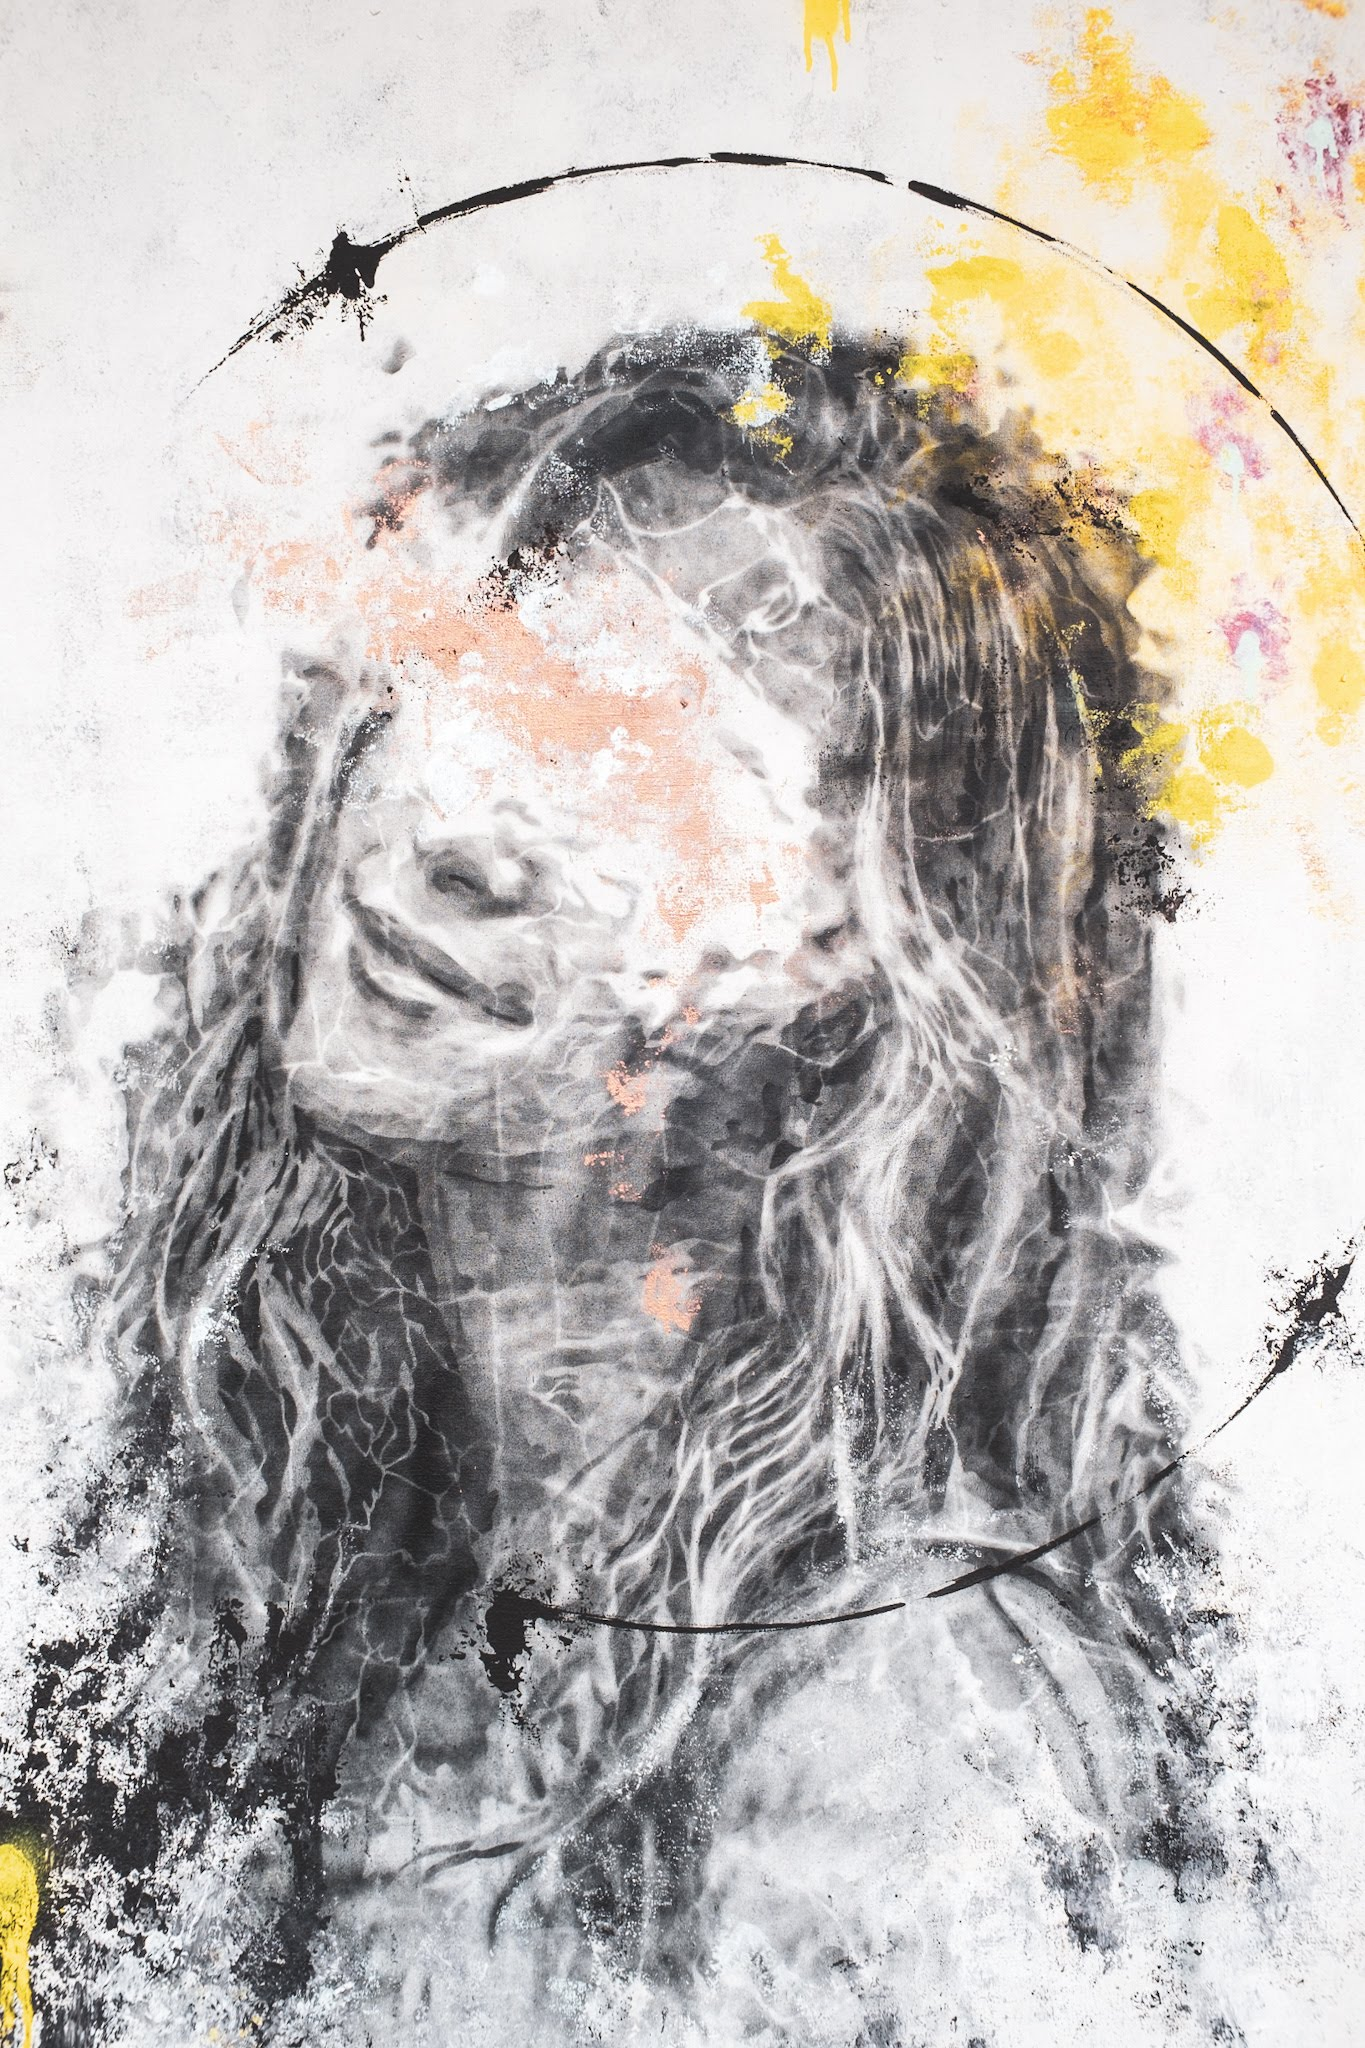 untitled II sebastian eismann handcut stencil art